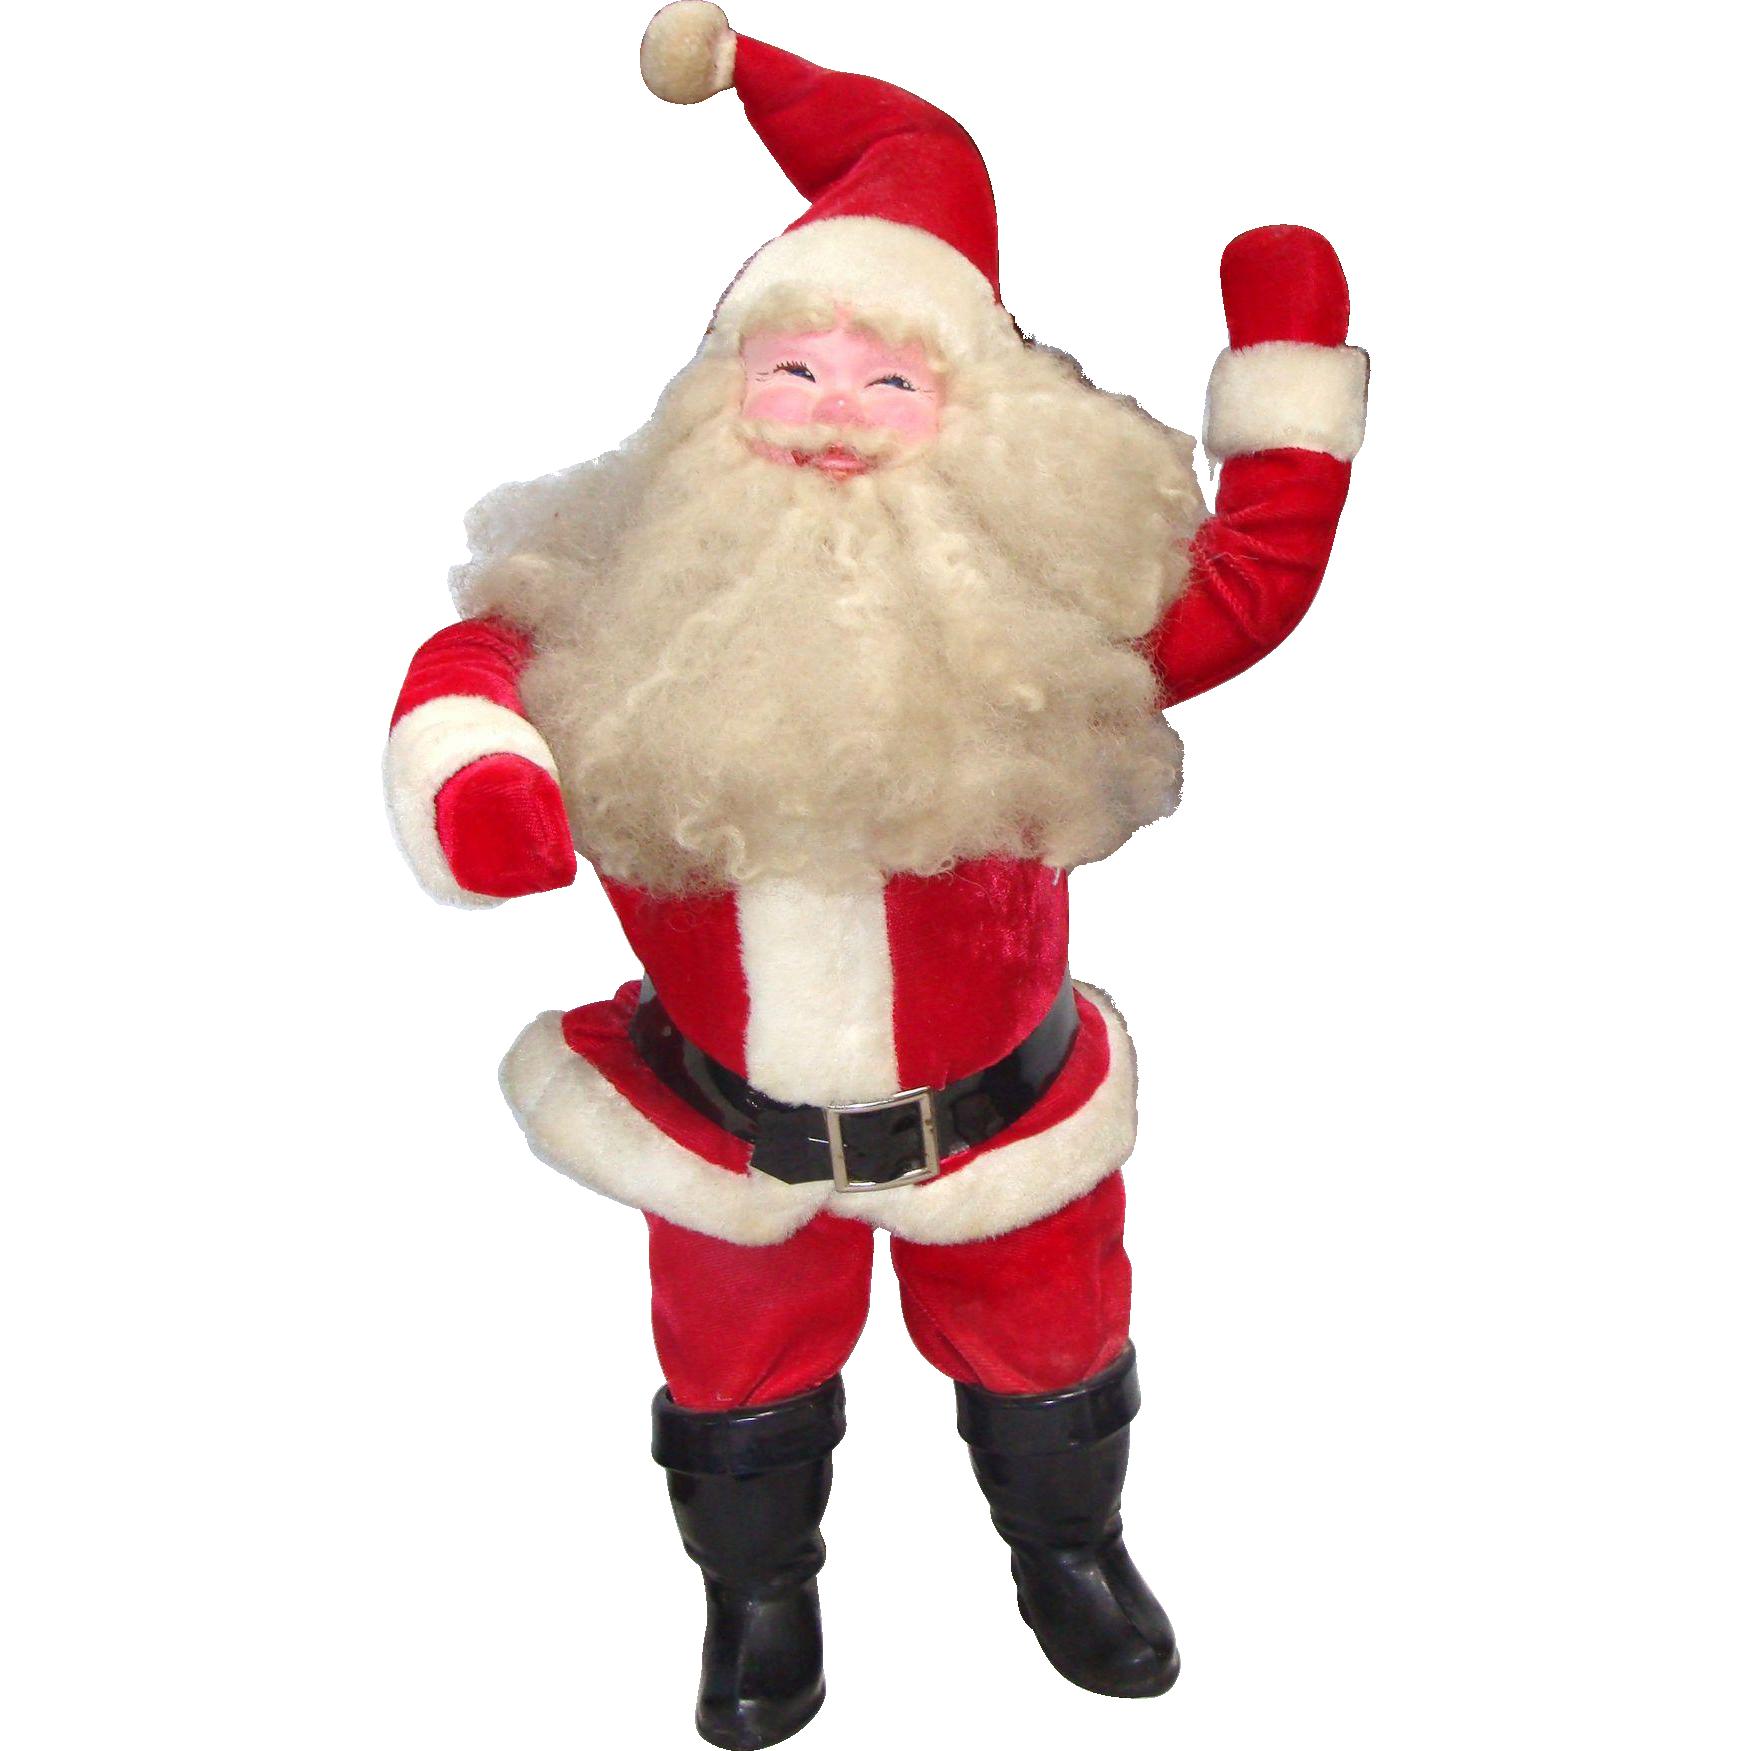 Large Harold Gale Display Santa From Bayberrysantiquedolls